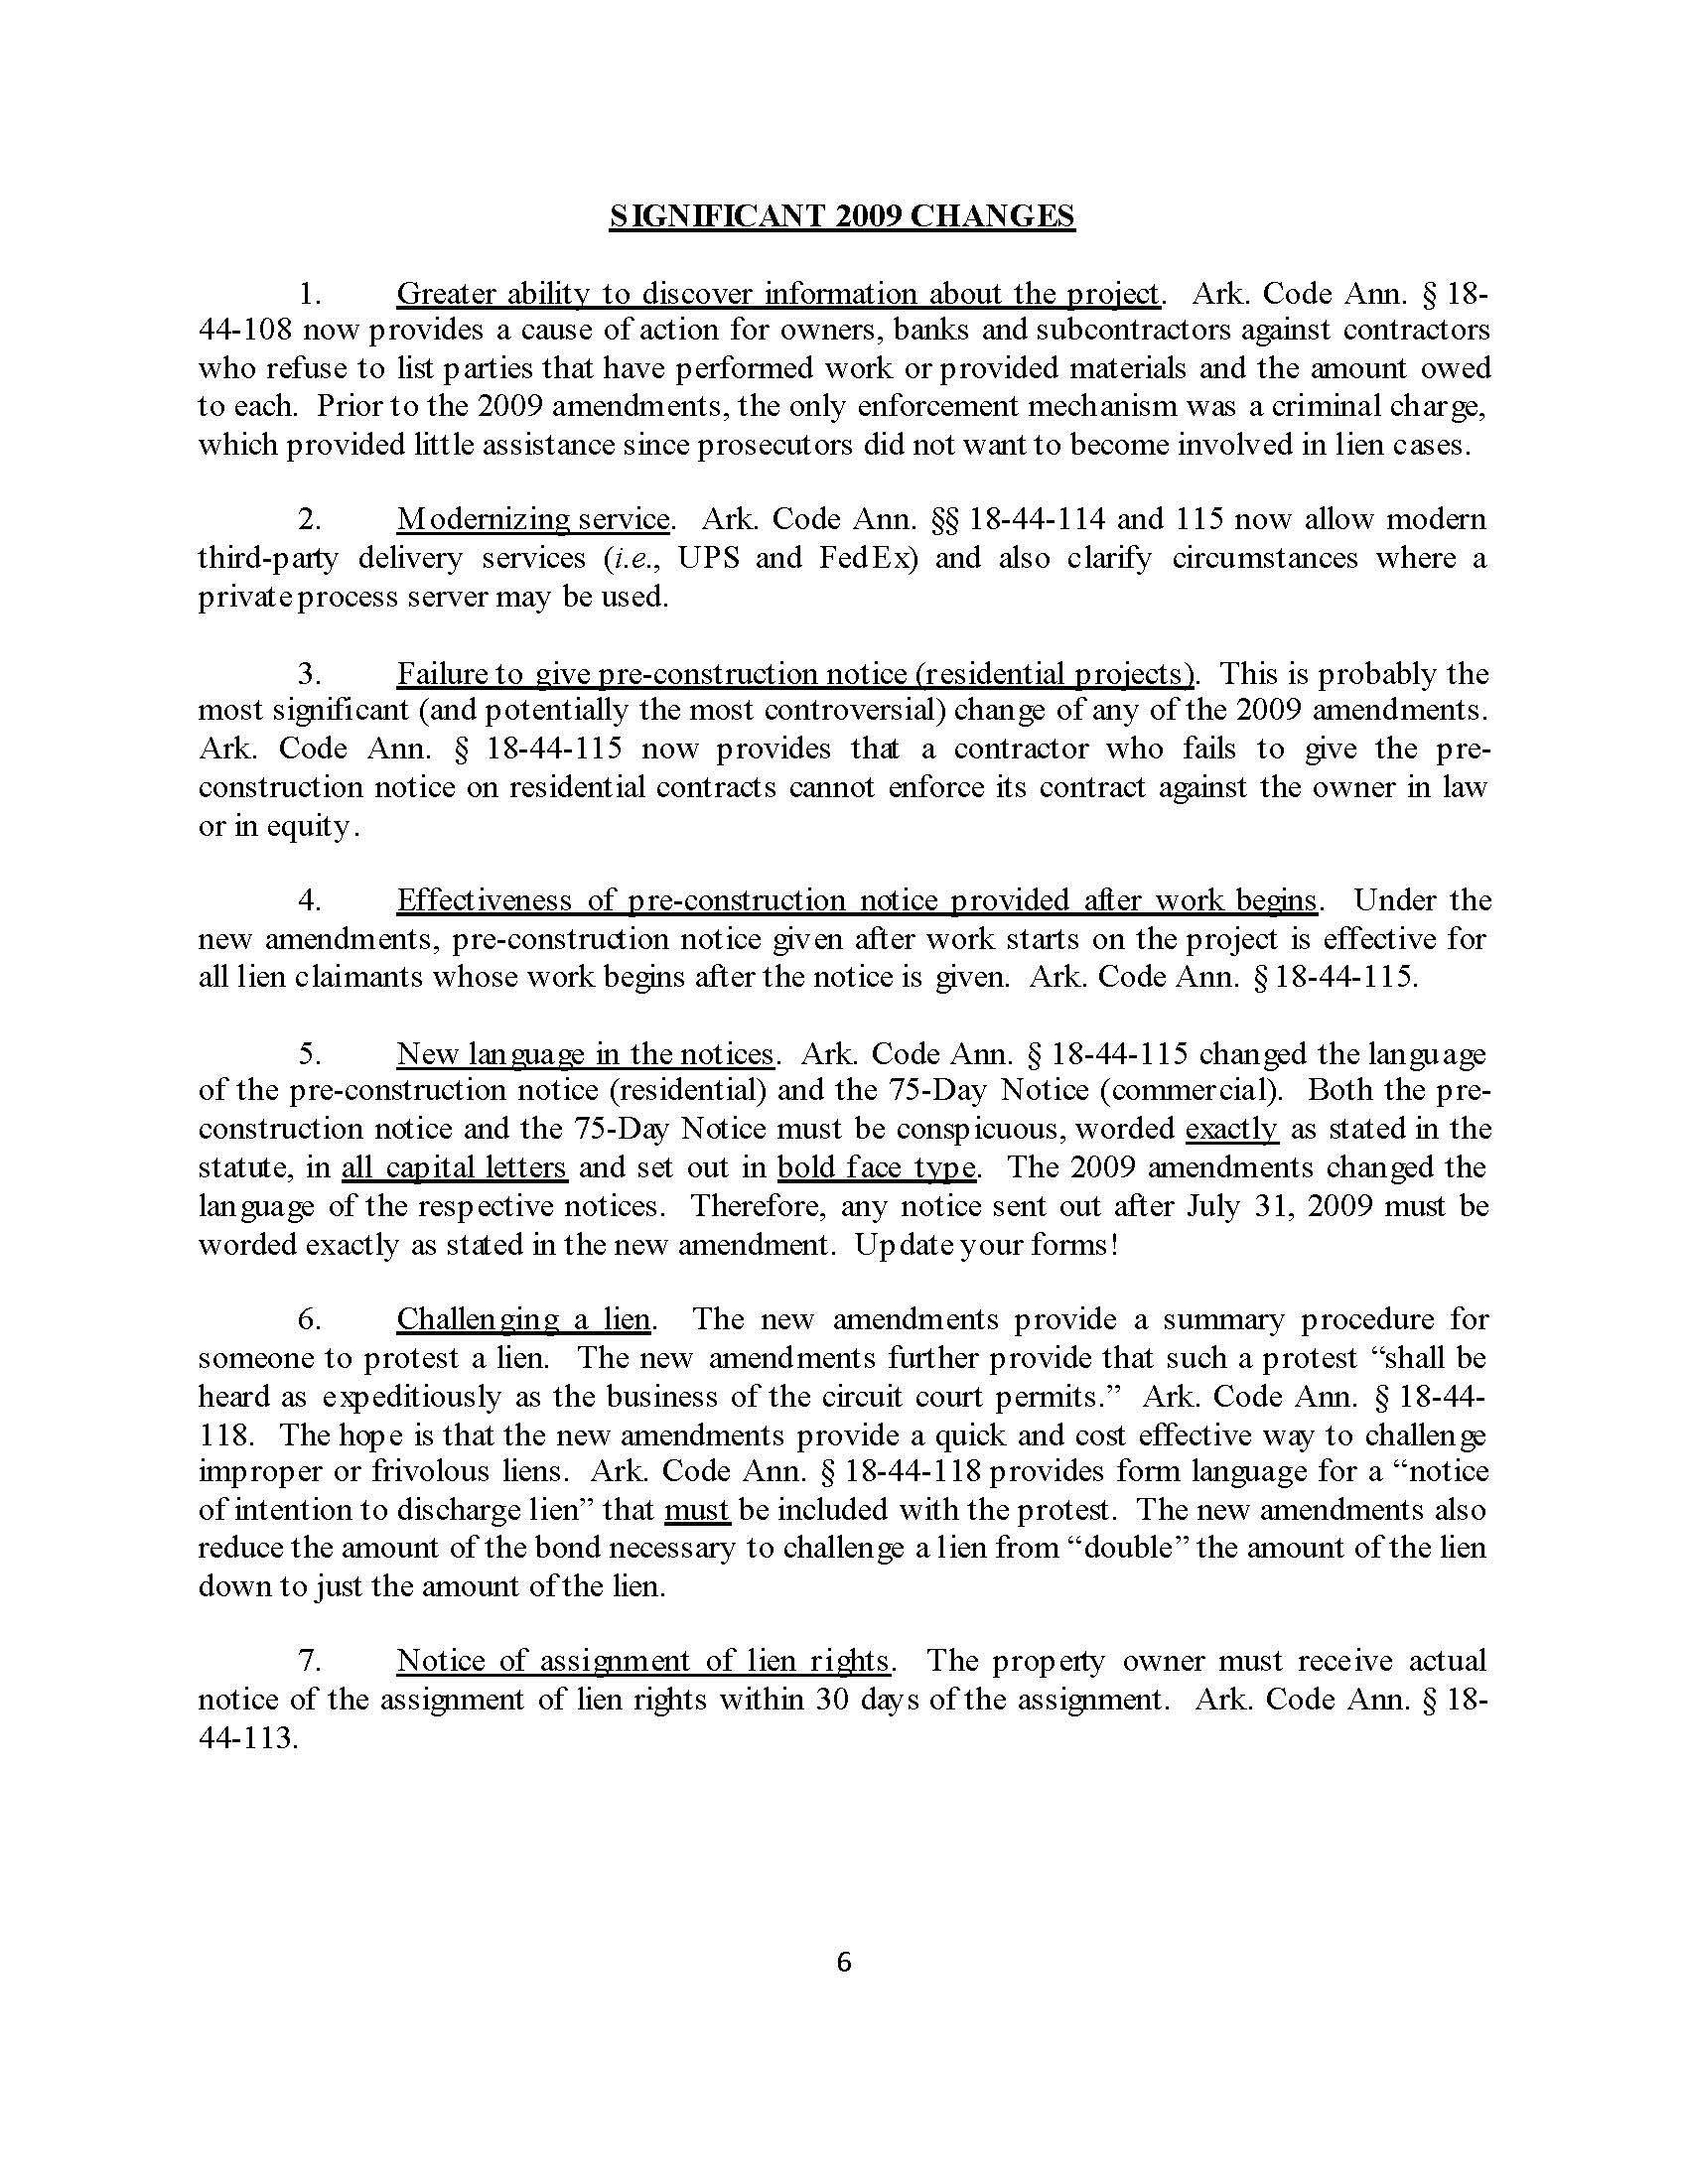 Summary-Materialman-Lien-Statutes-and-Amendments-faulkner-2011_Page_6.jpg